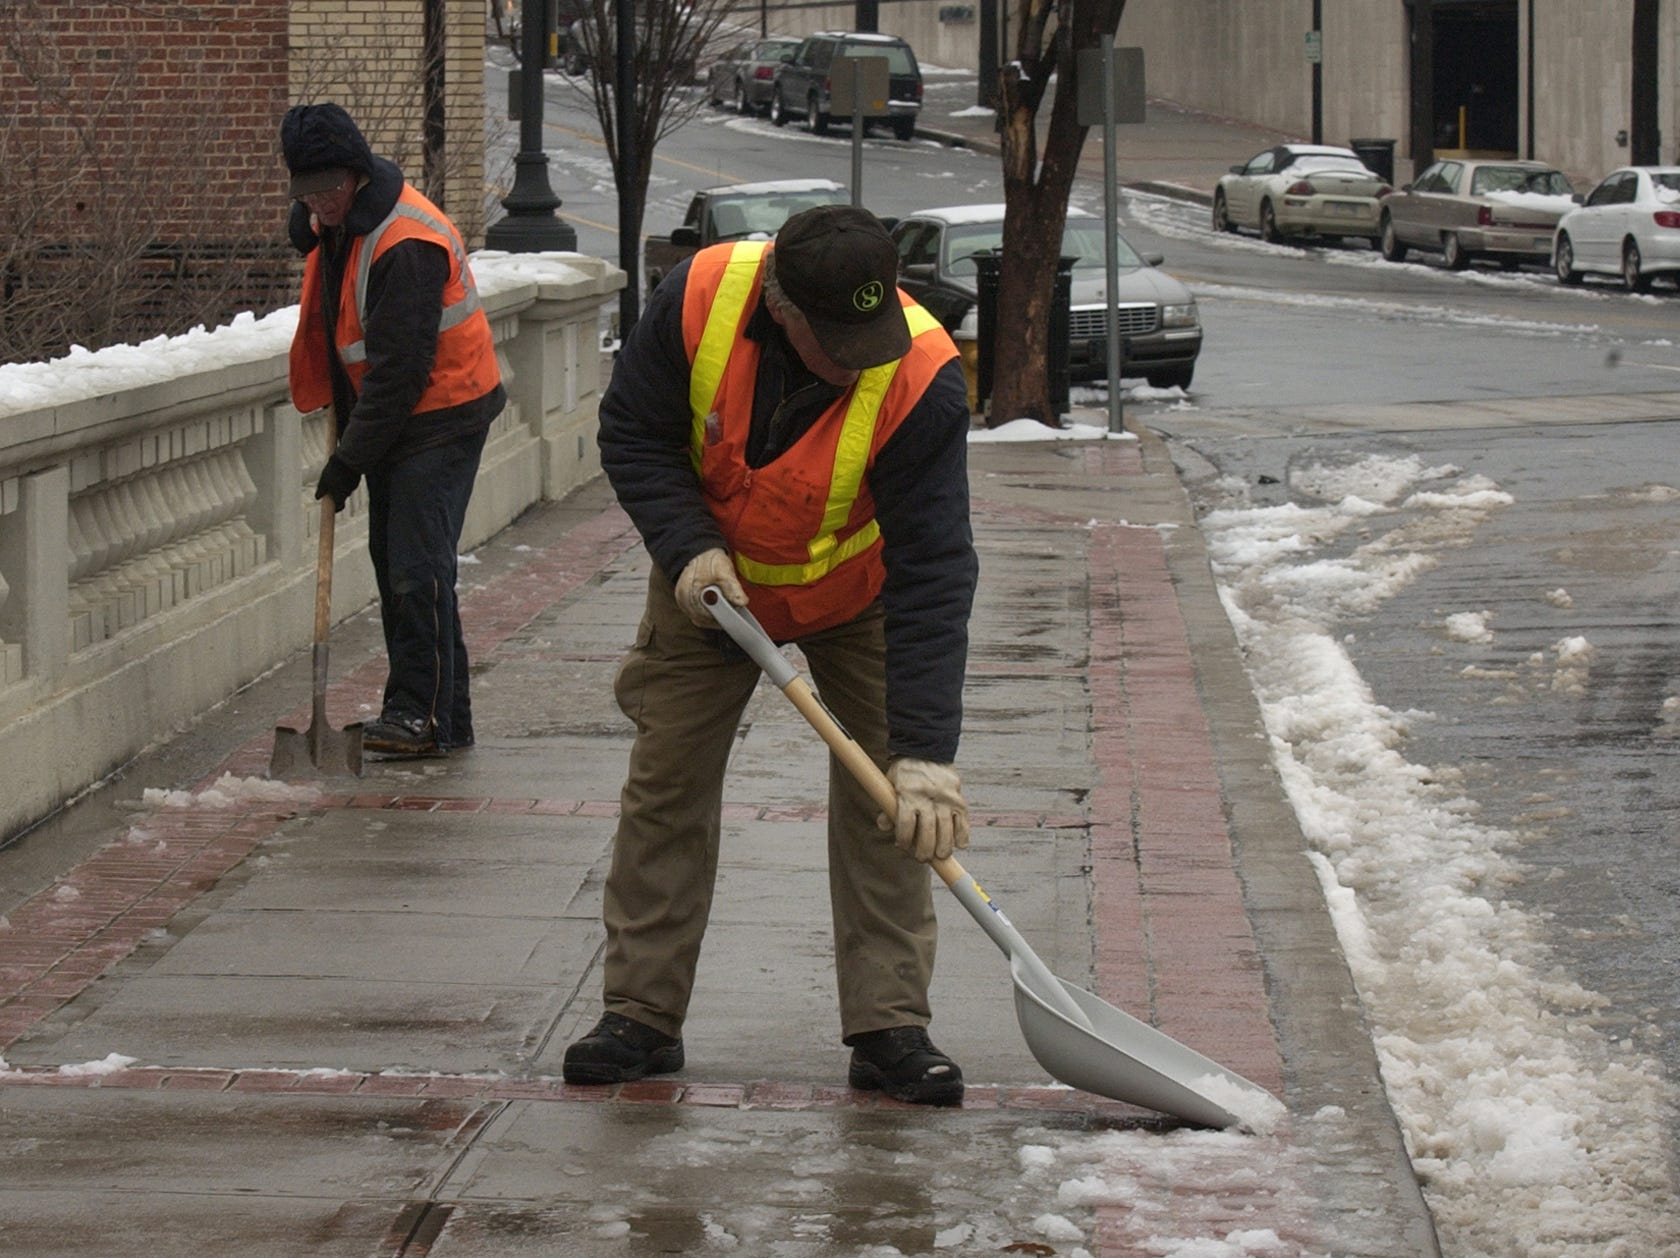 Charles Anderson, left, and Ed Webb, right, shovel snow along Main Street on Thursday, February 1, 2007.